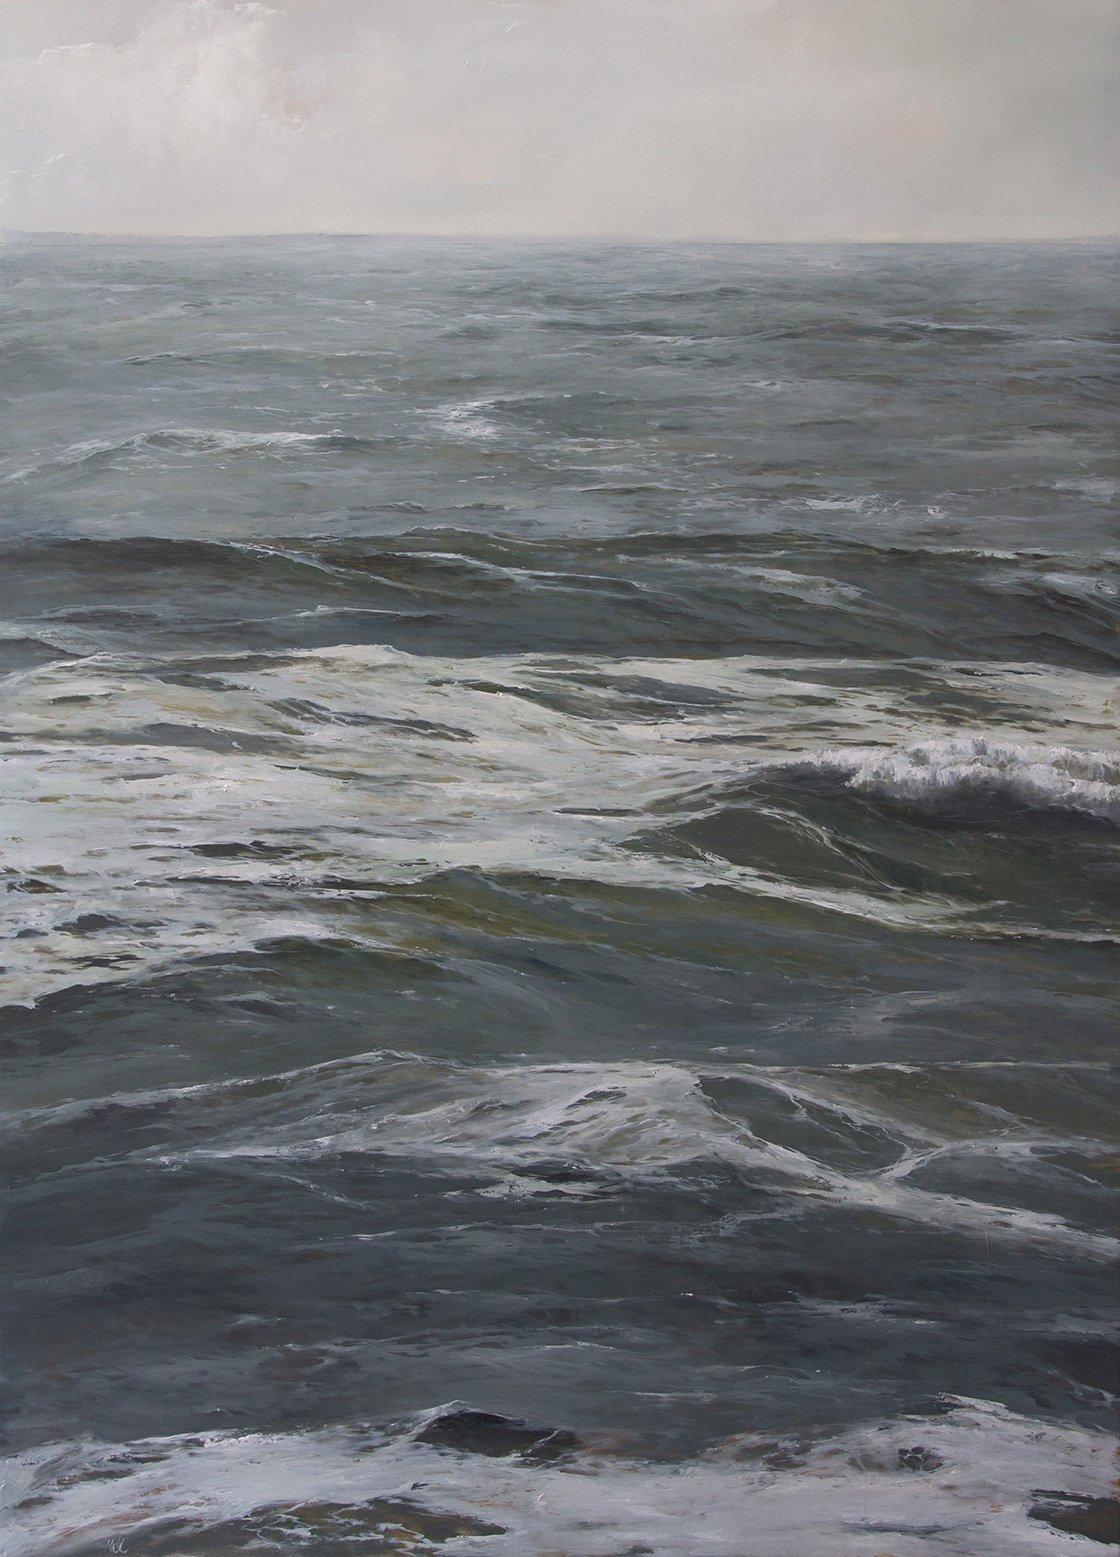 Under Current by Adam Hall